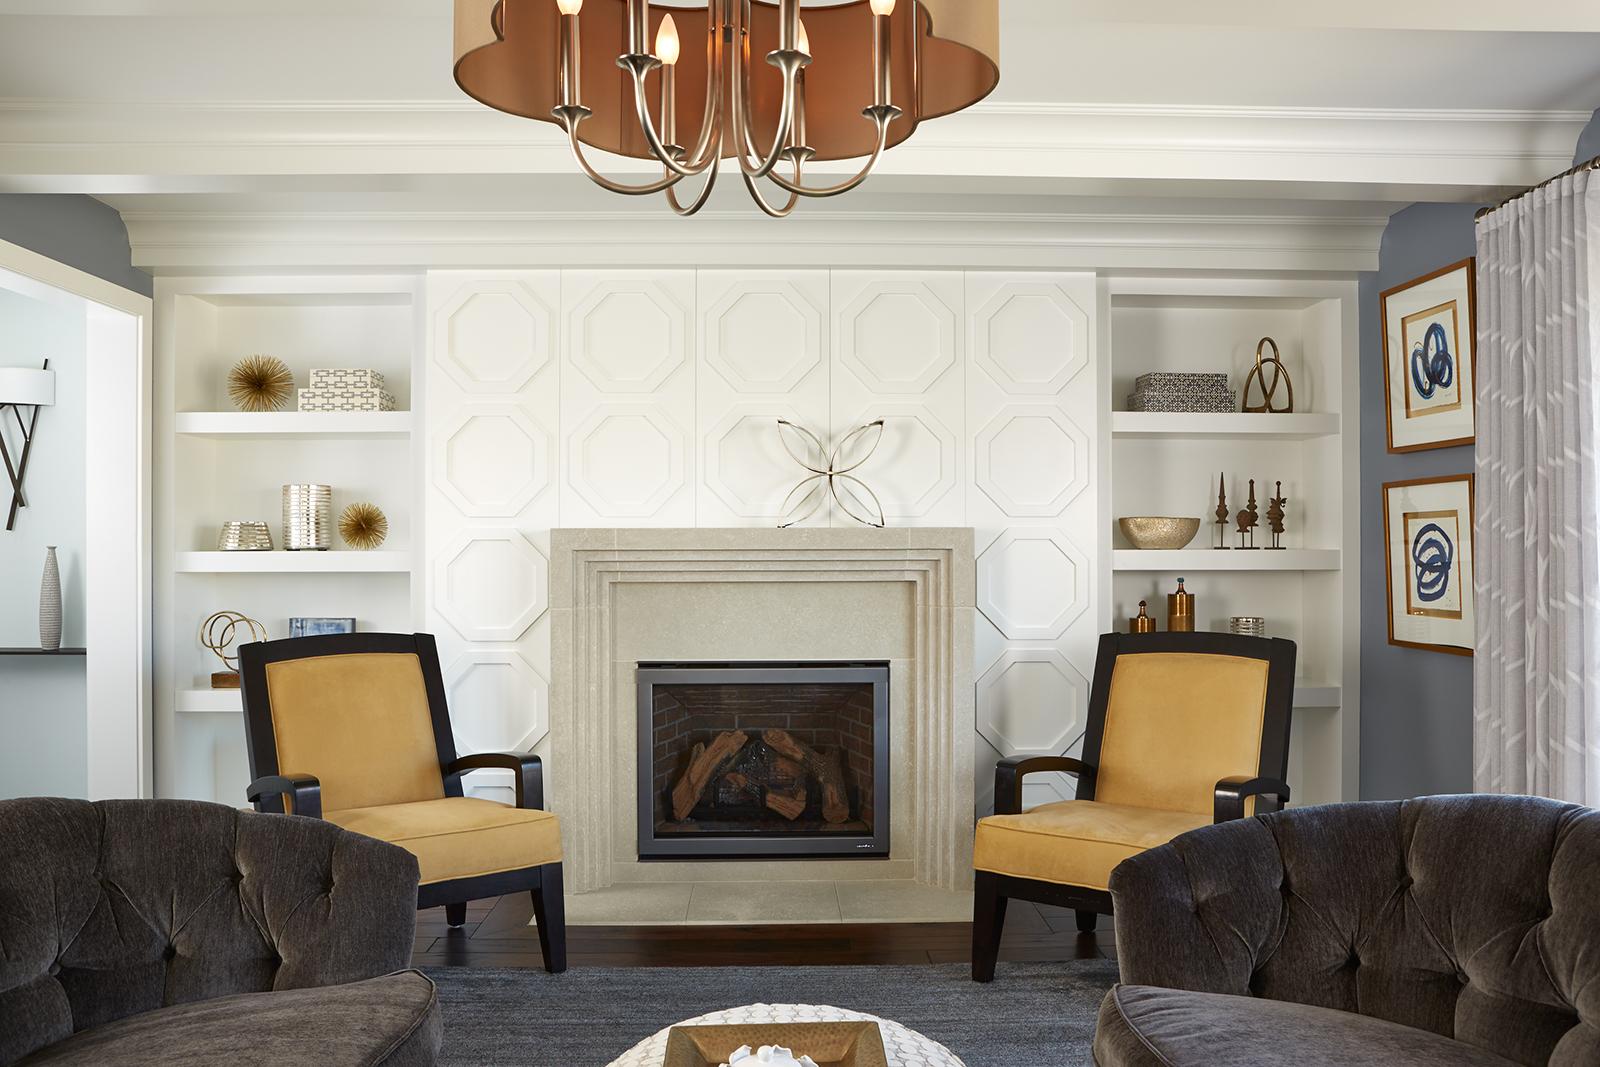 Edina_hexagon_fireplace.jpg